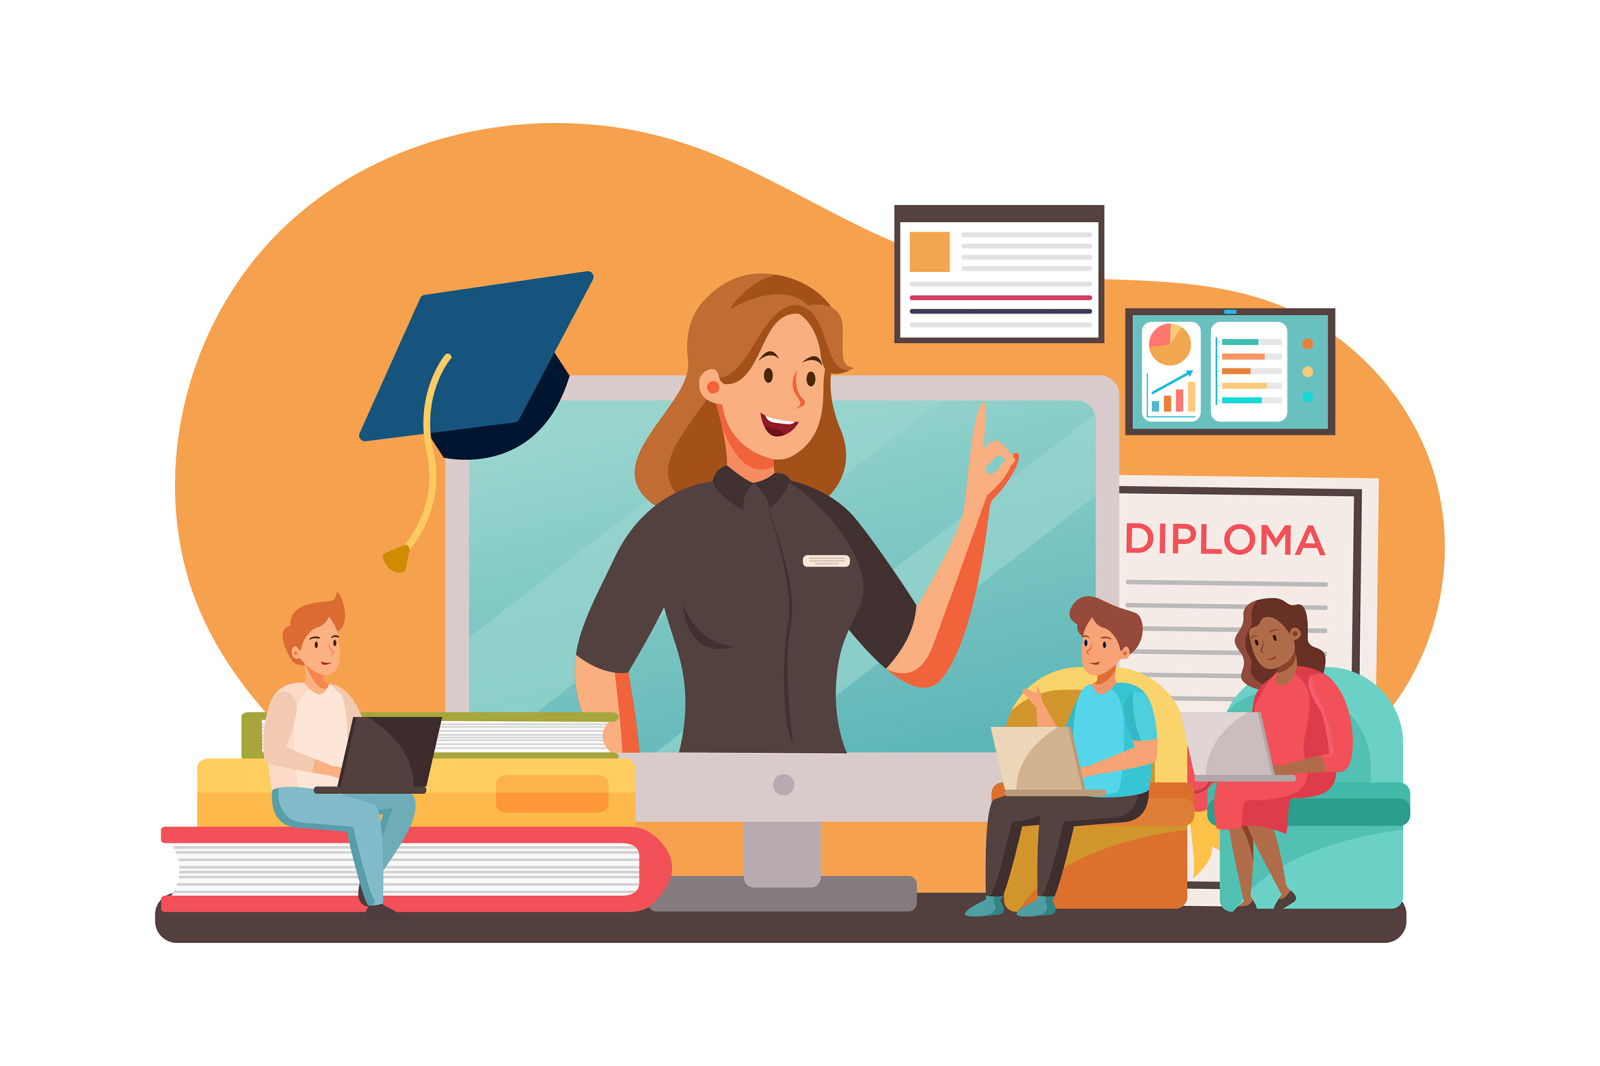 M117_Online Education Illustrations